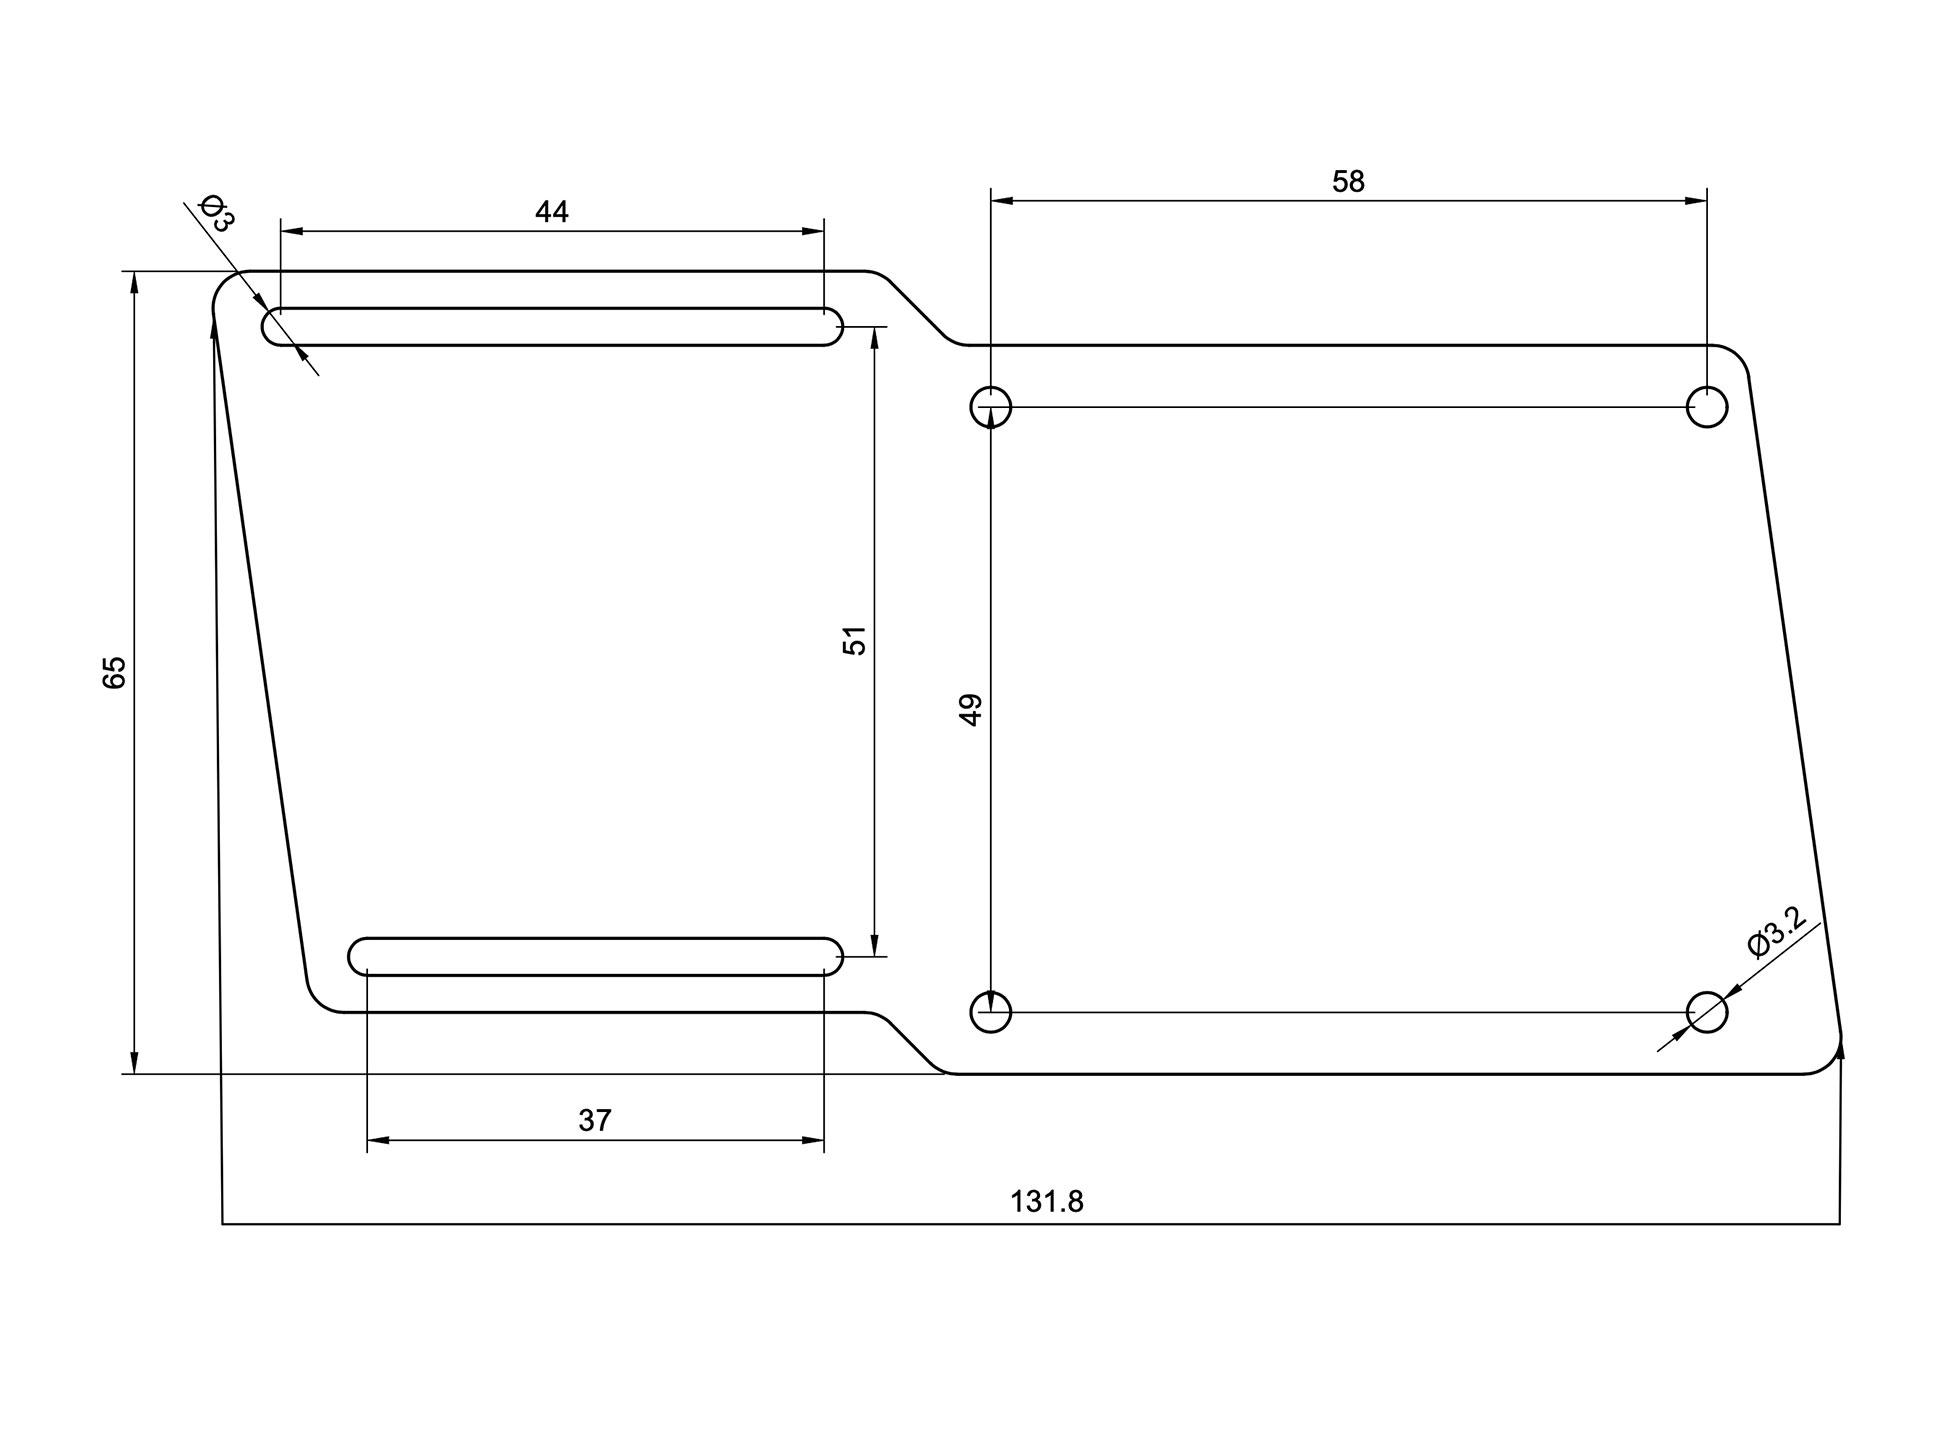 3d_printing_plate-drawing.jpg